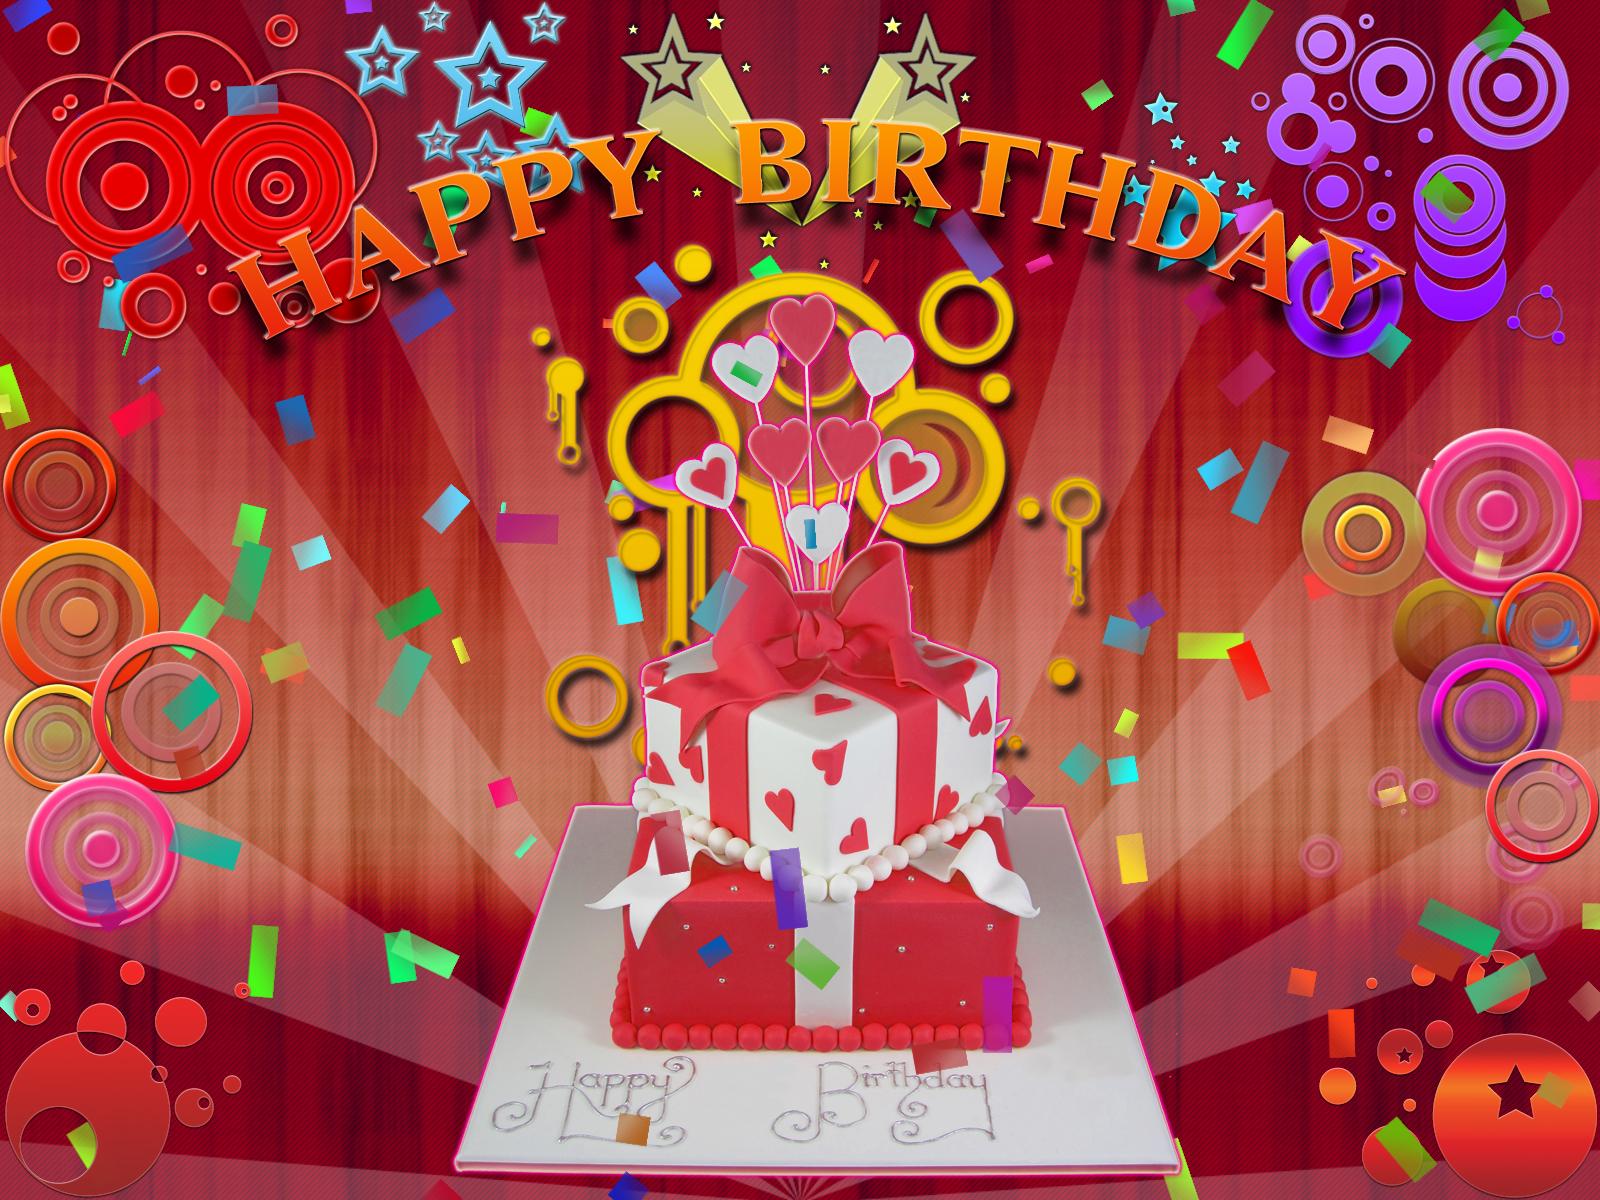 Happy Birthday Wallpapers Wallpupcom 1600x1200